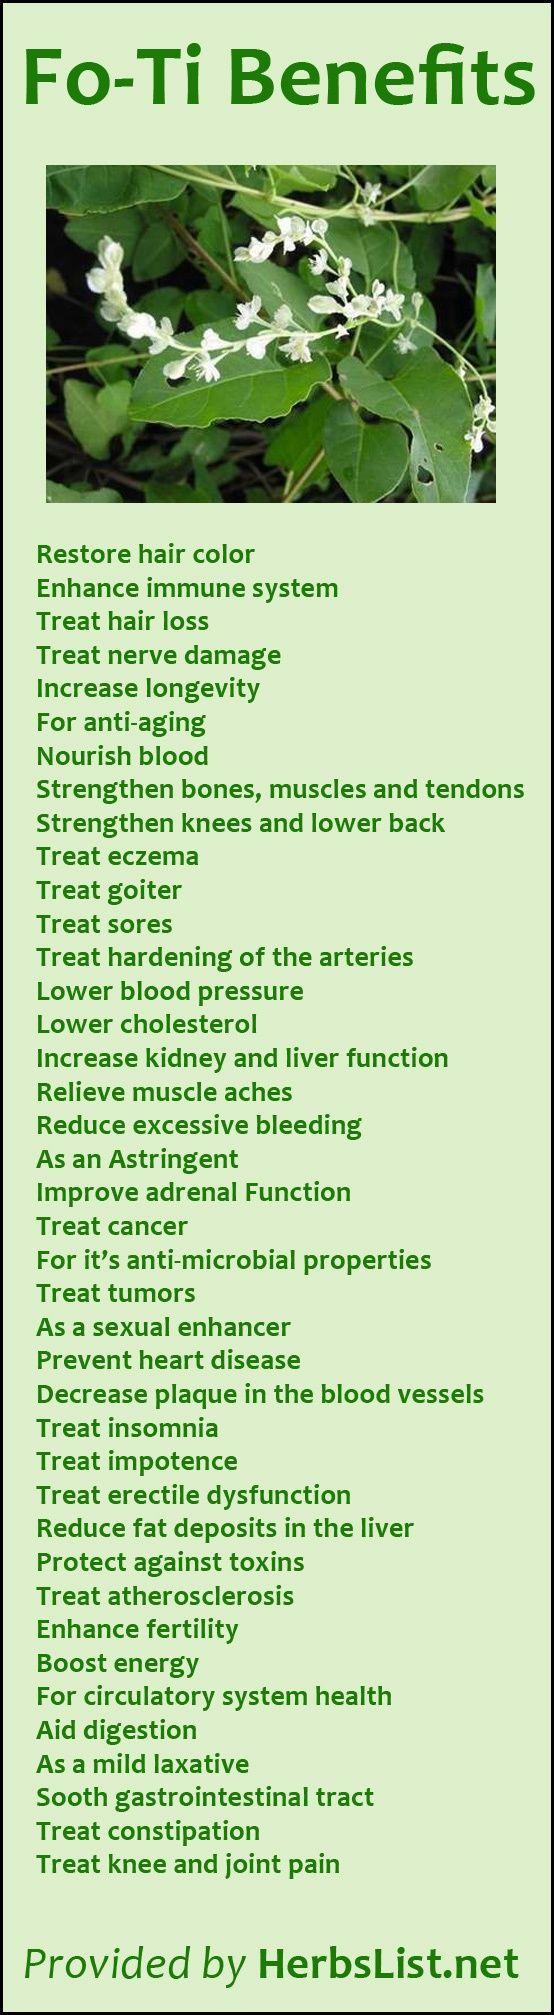 #Fo-Ti Benefits...http://www.medicinal-botanicals.com/